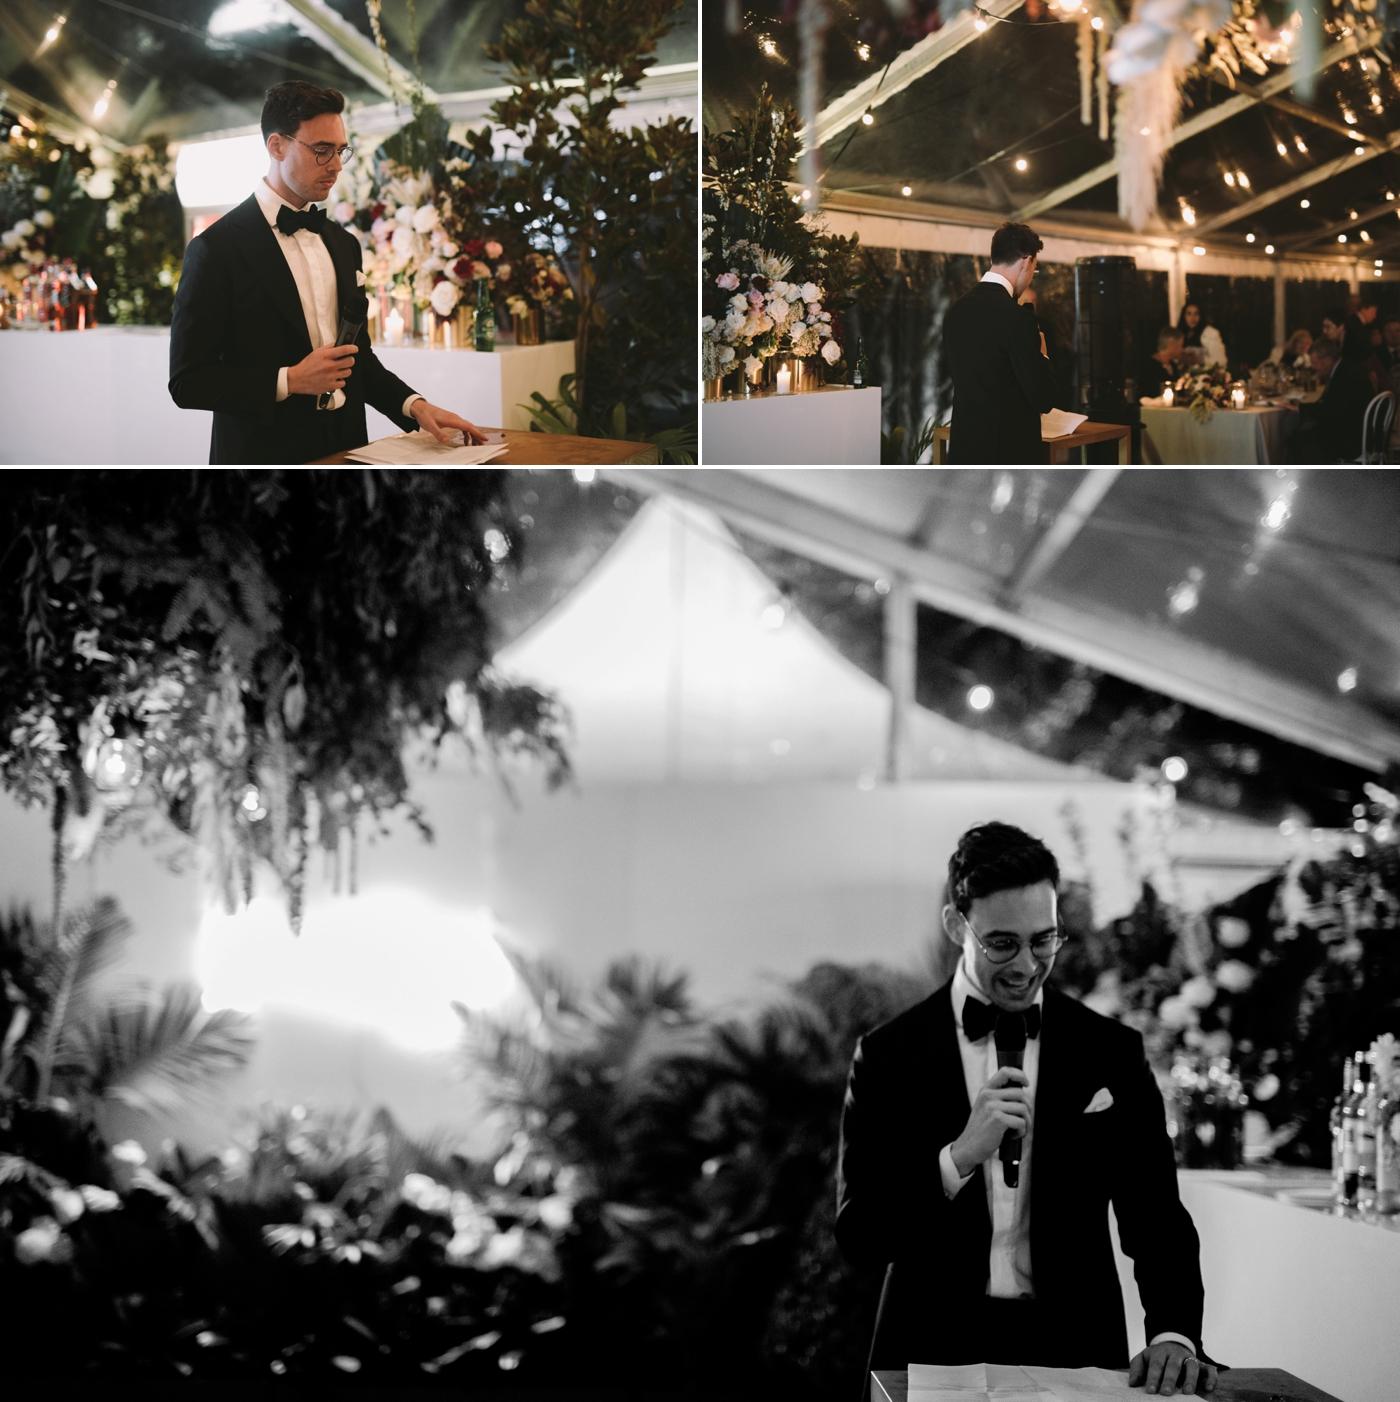 Katie and Ben - Natural Wedding Photography in Adelaide - Beautiful, Candid Wedding Photographer - Adelaide Hills Wedding - Katherine Schultz - www.katherineschultzphotography.com_0080.jpg